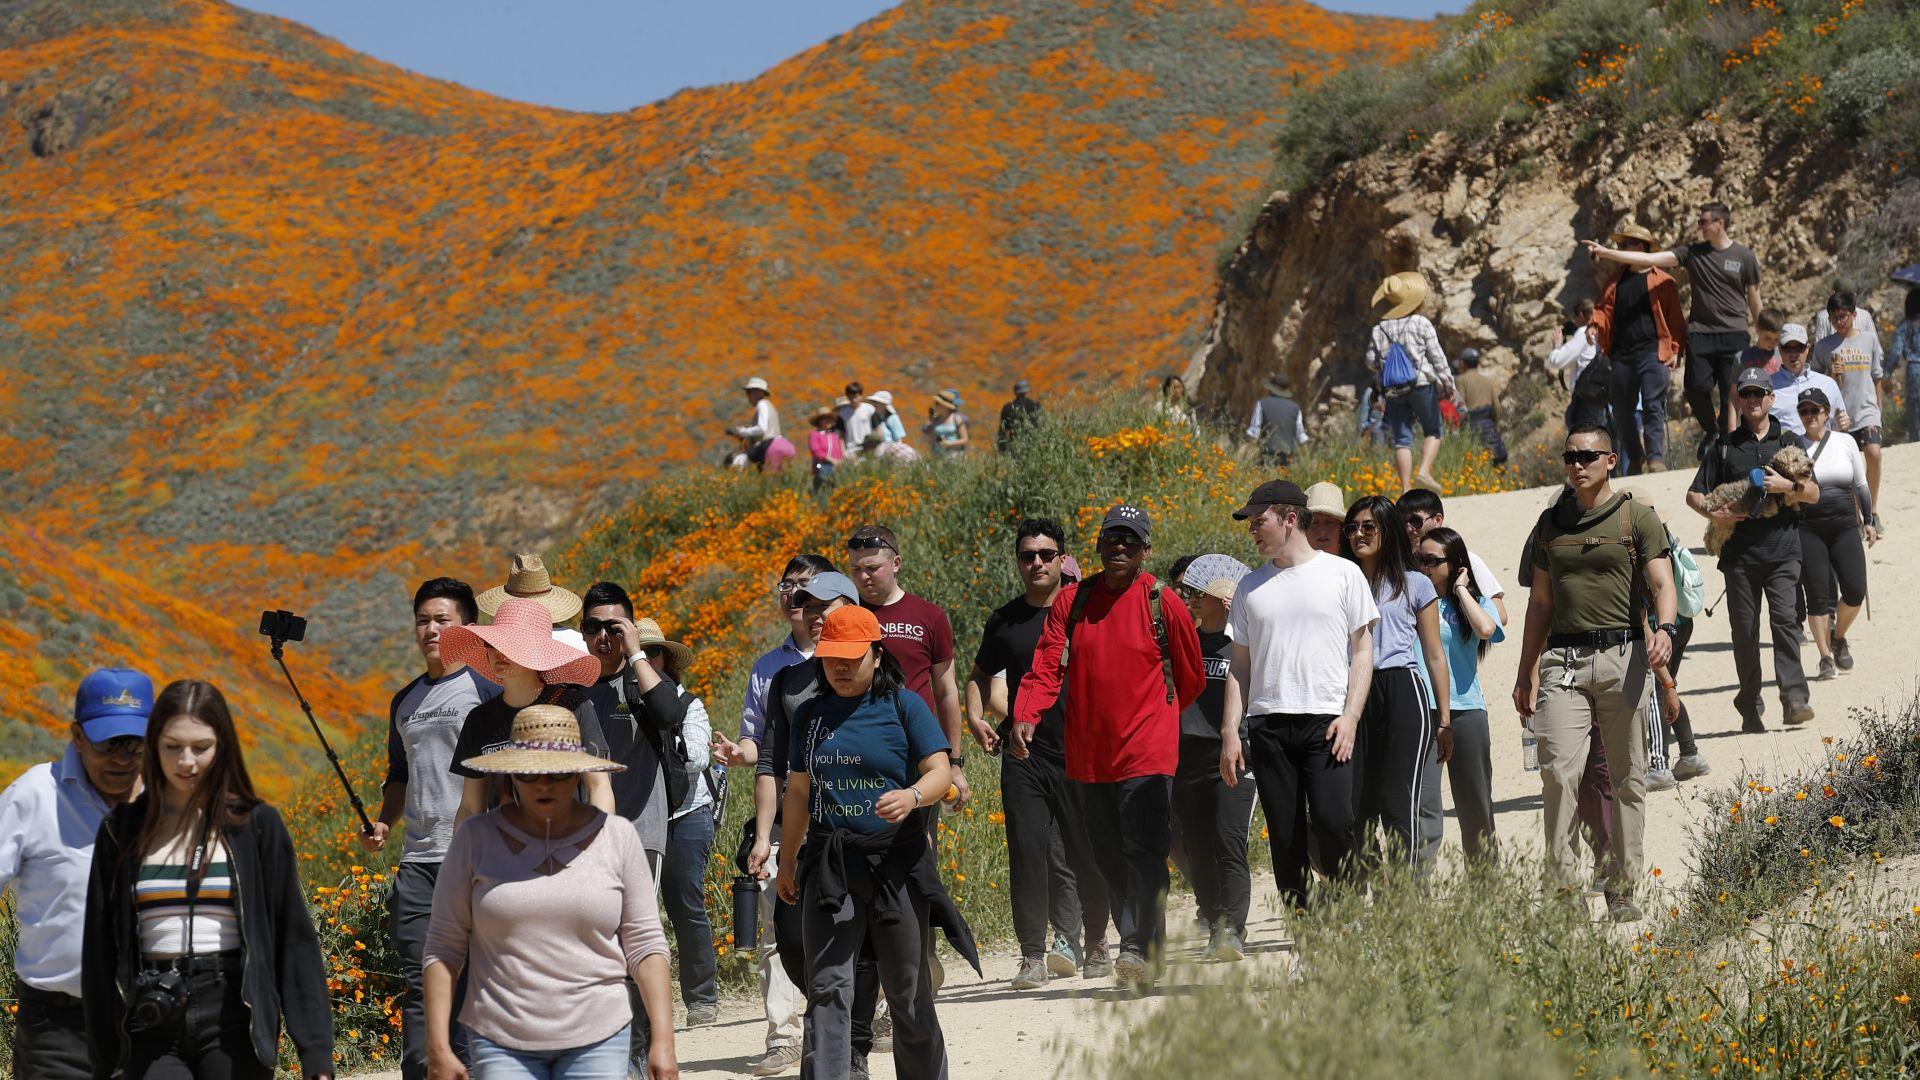 Струпването на десетки хиляди туристи край градчето Лейк Елсинор в